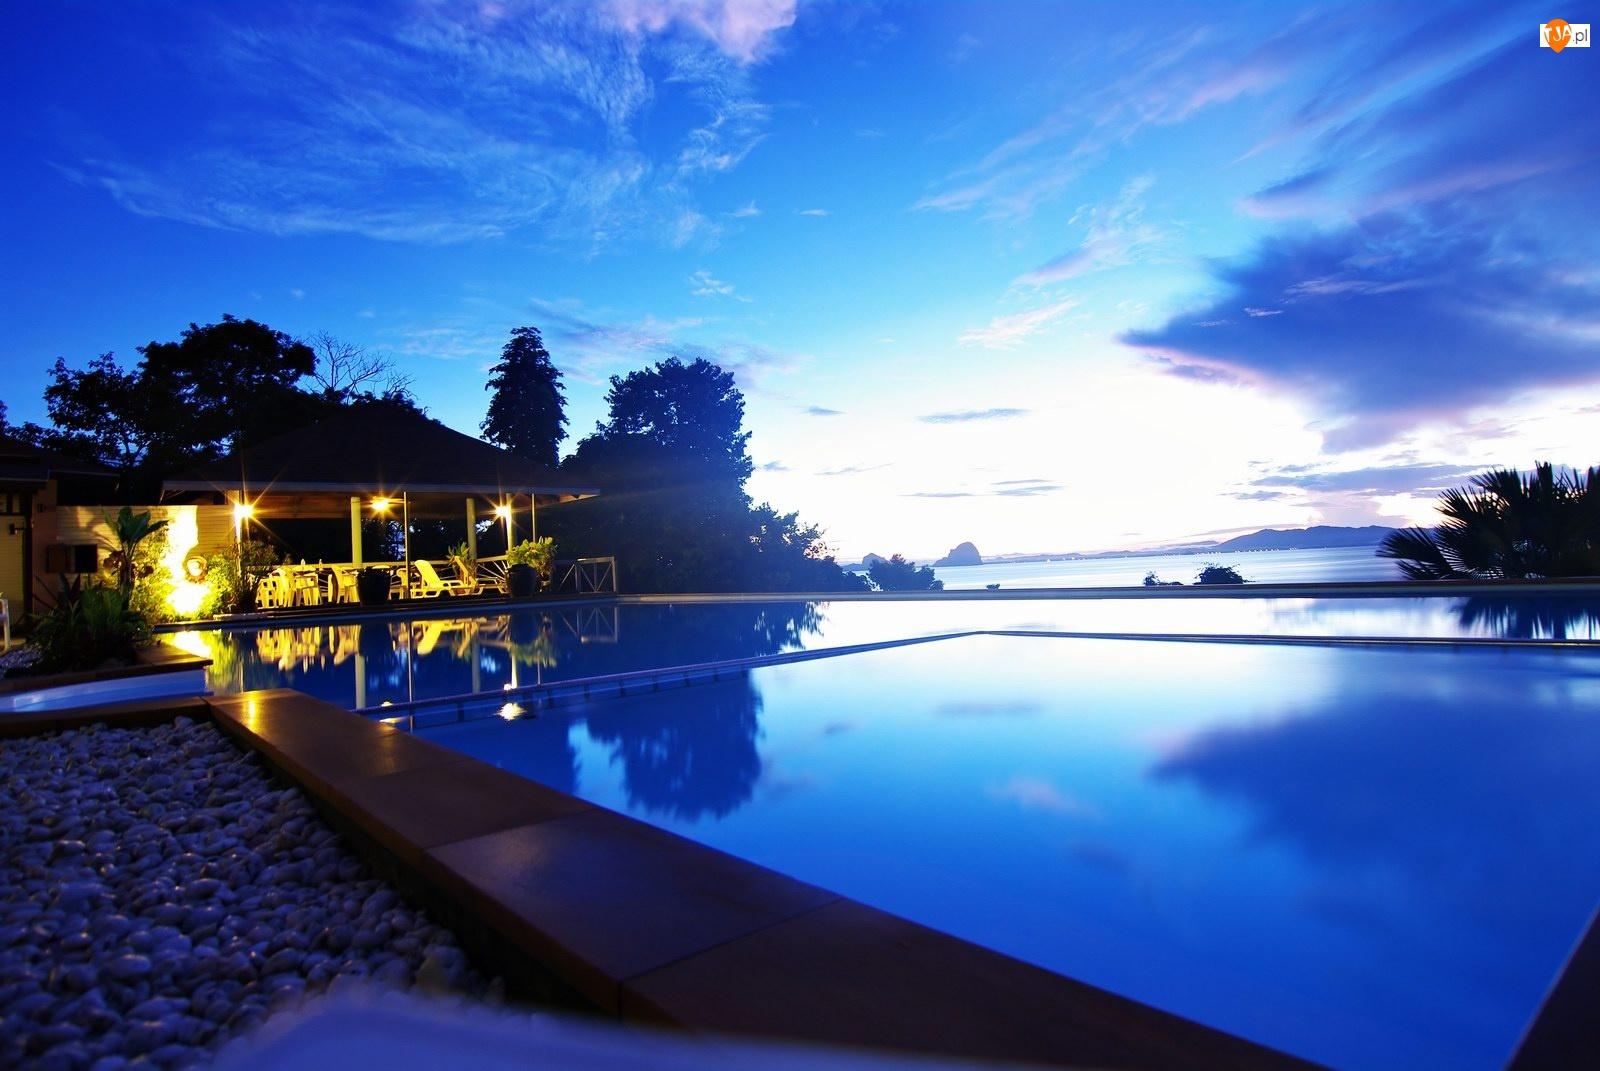 Tajlandia, Hotel, Basen